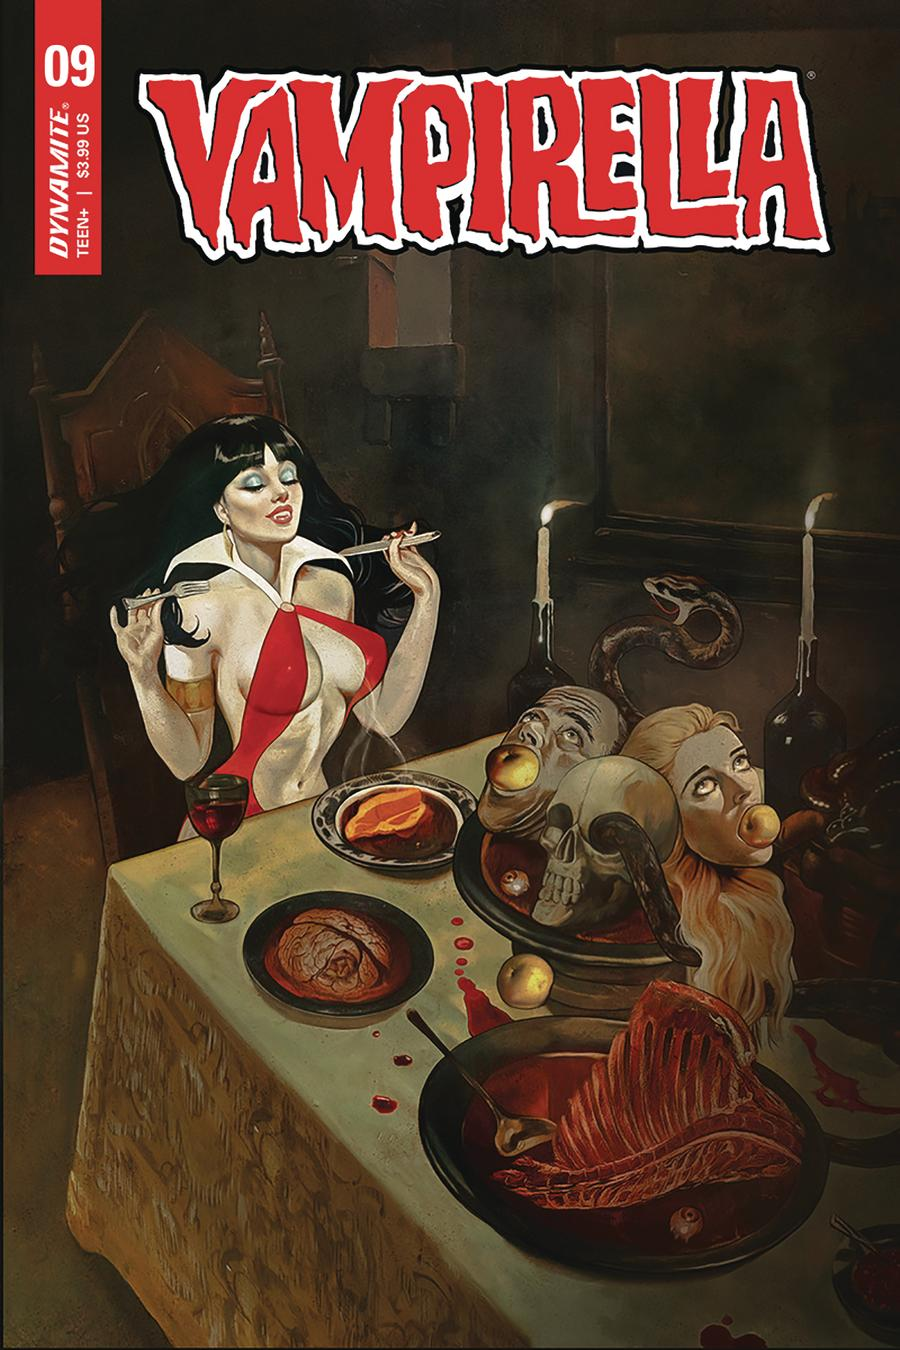 Vampirella Vol 8 #9 Cover C Variant Fay Dalton Cover